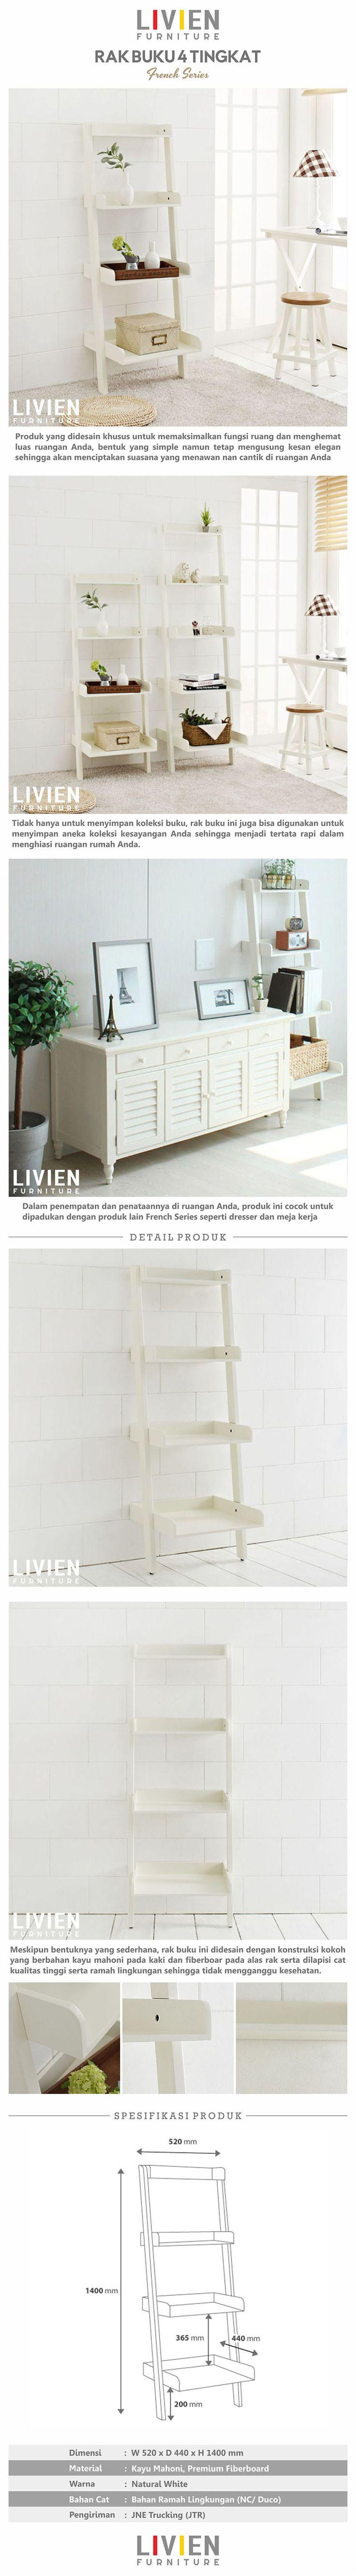 Rak Buku French Series (4 Tingkat)  #homedecor #livingroom #homeideas #interiorideas #furniture